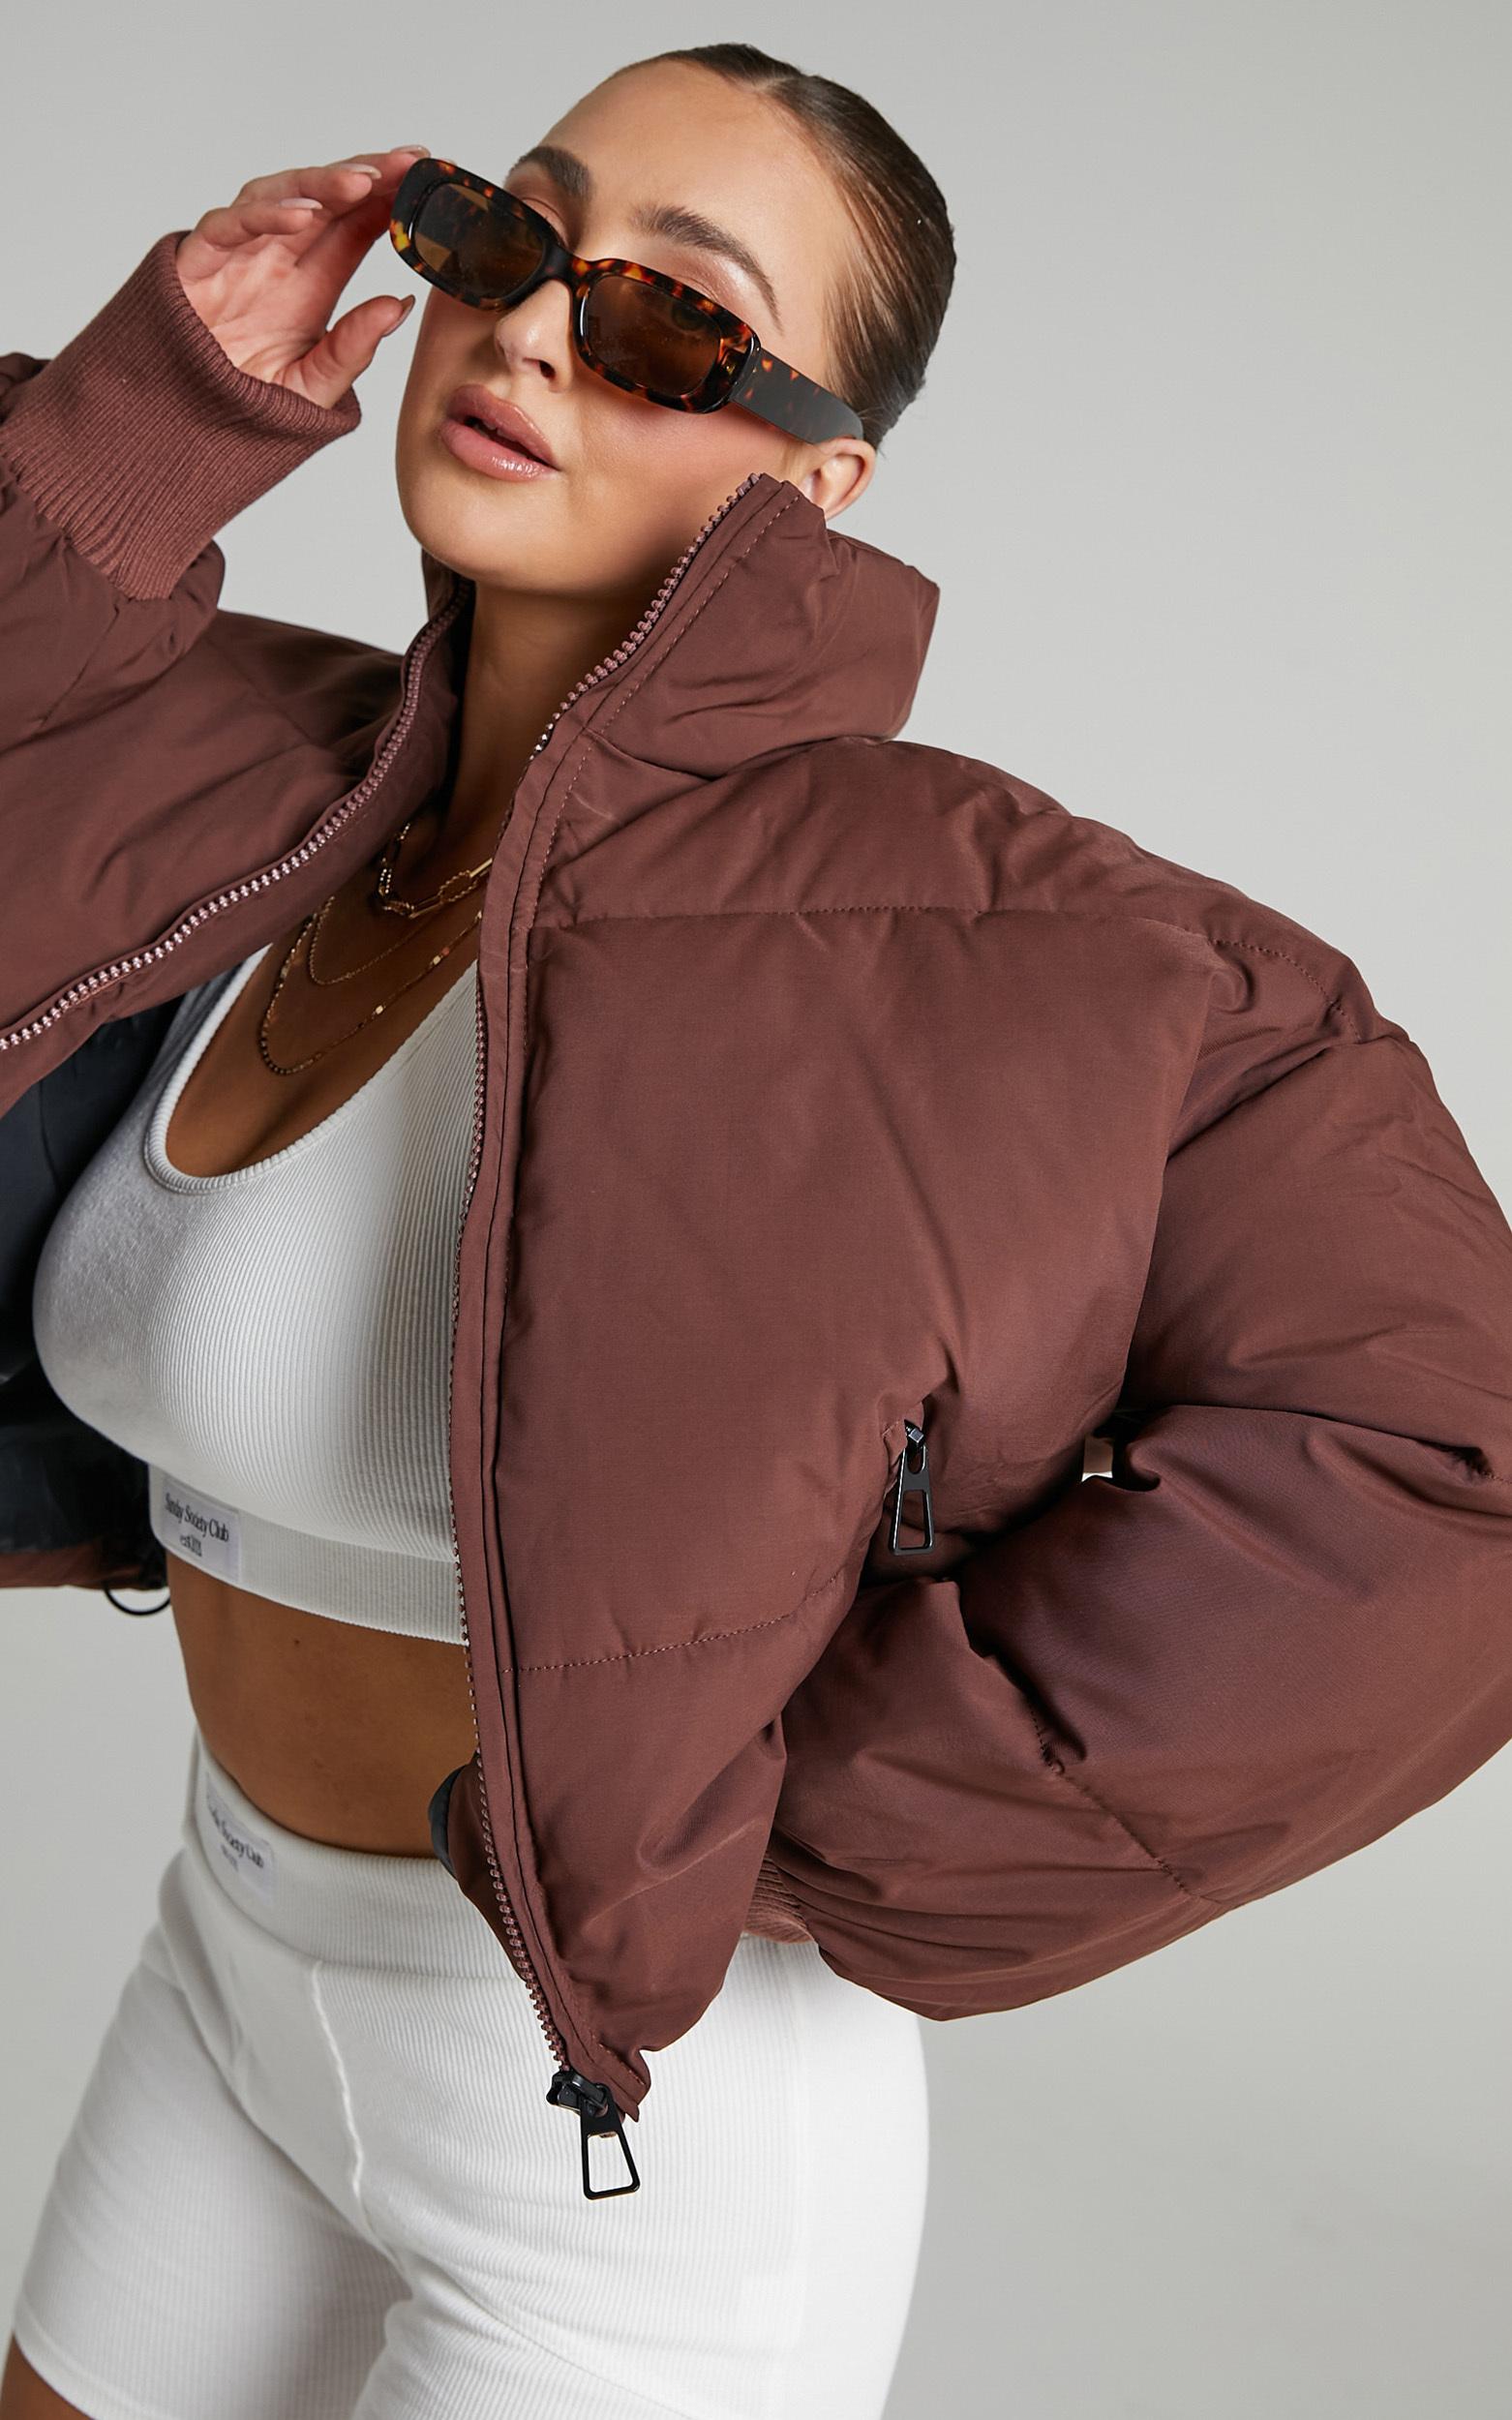 Windsor Puffer Jacket in Chocolate - 06, BRN4, hi-res image number null